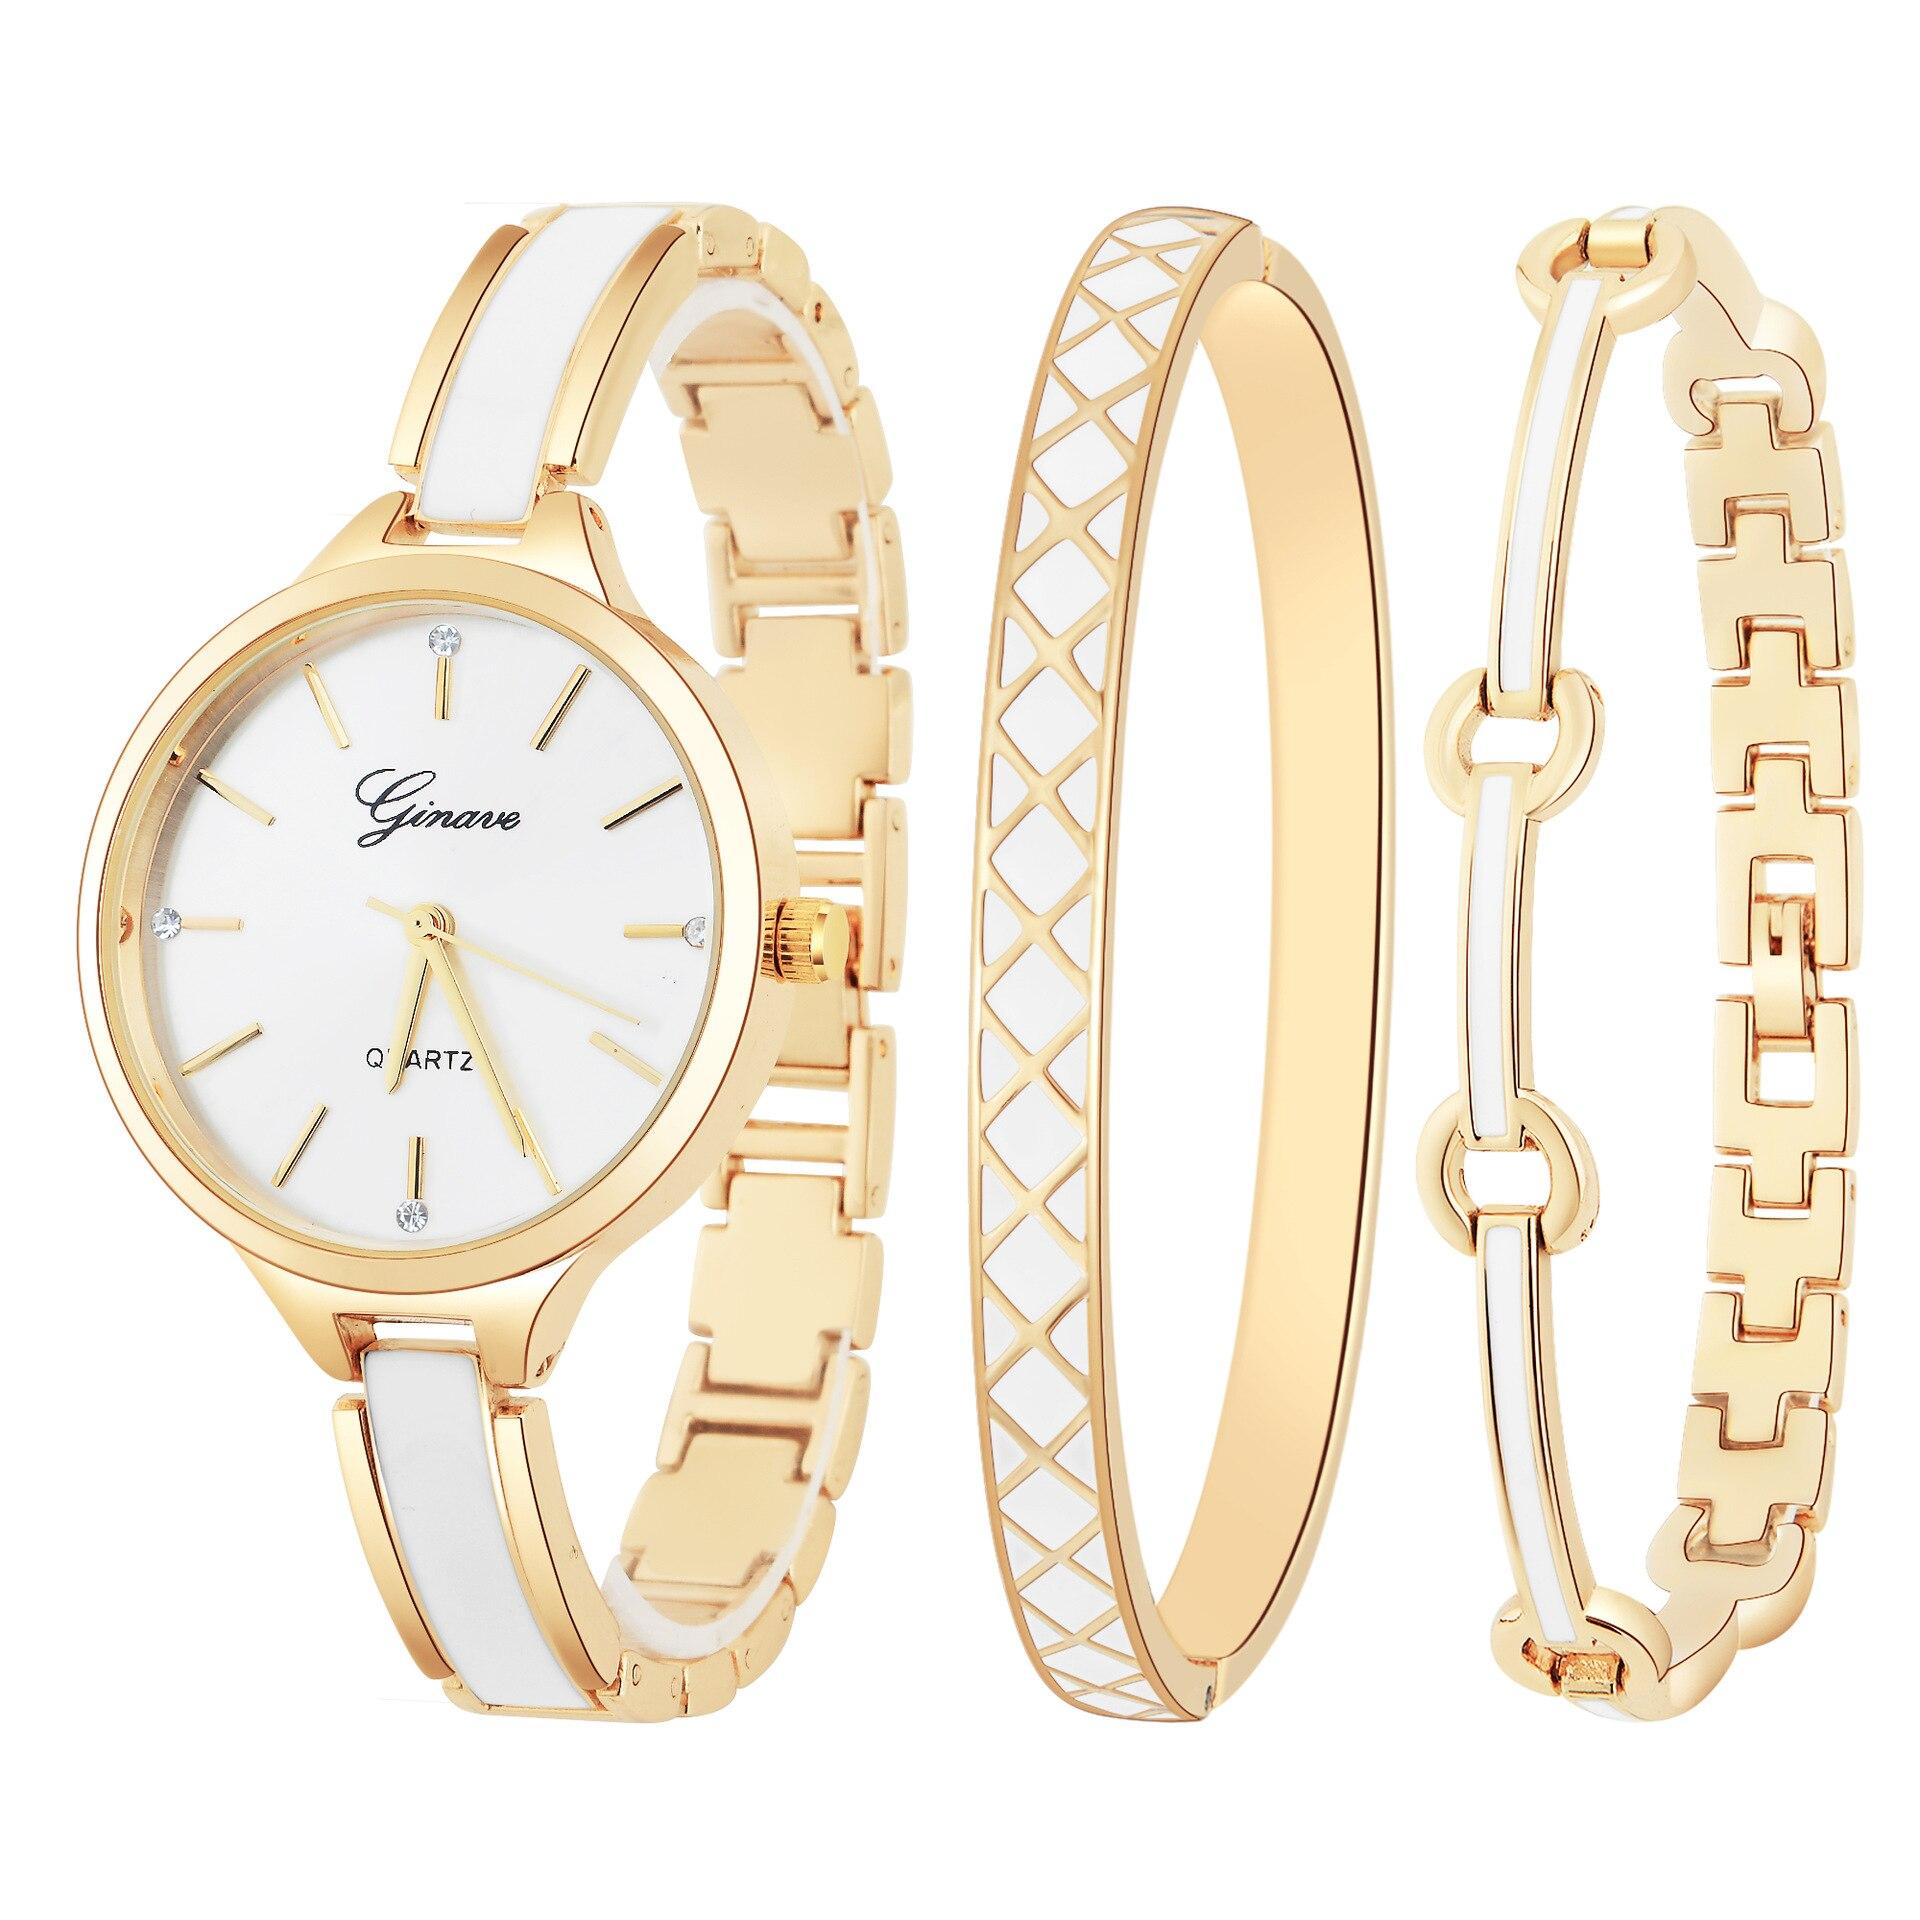 Fashion Women'S Watch Quartz Clock Bracele Bracelet 3PCS/SET Wrist Watches For Woman Female Luxury Relojes De Mujer De Moda 2020 enlarge